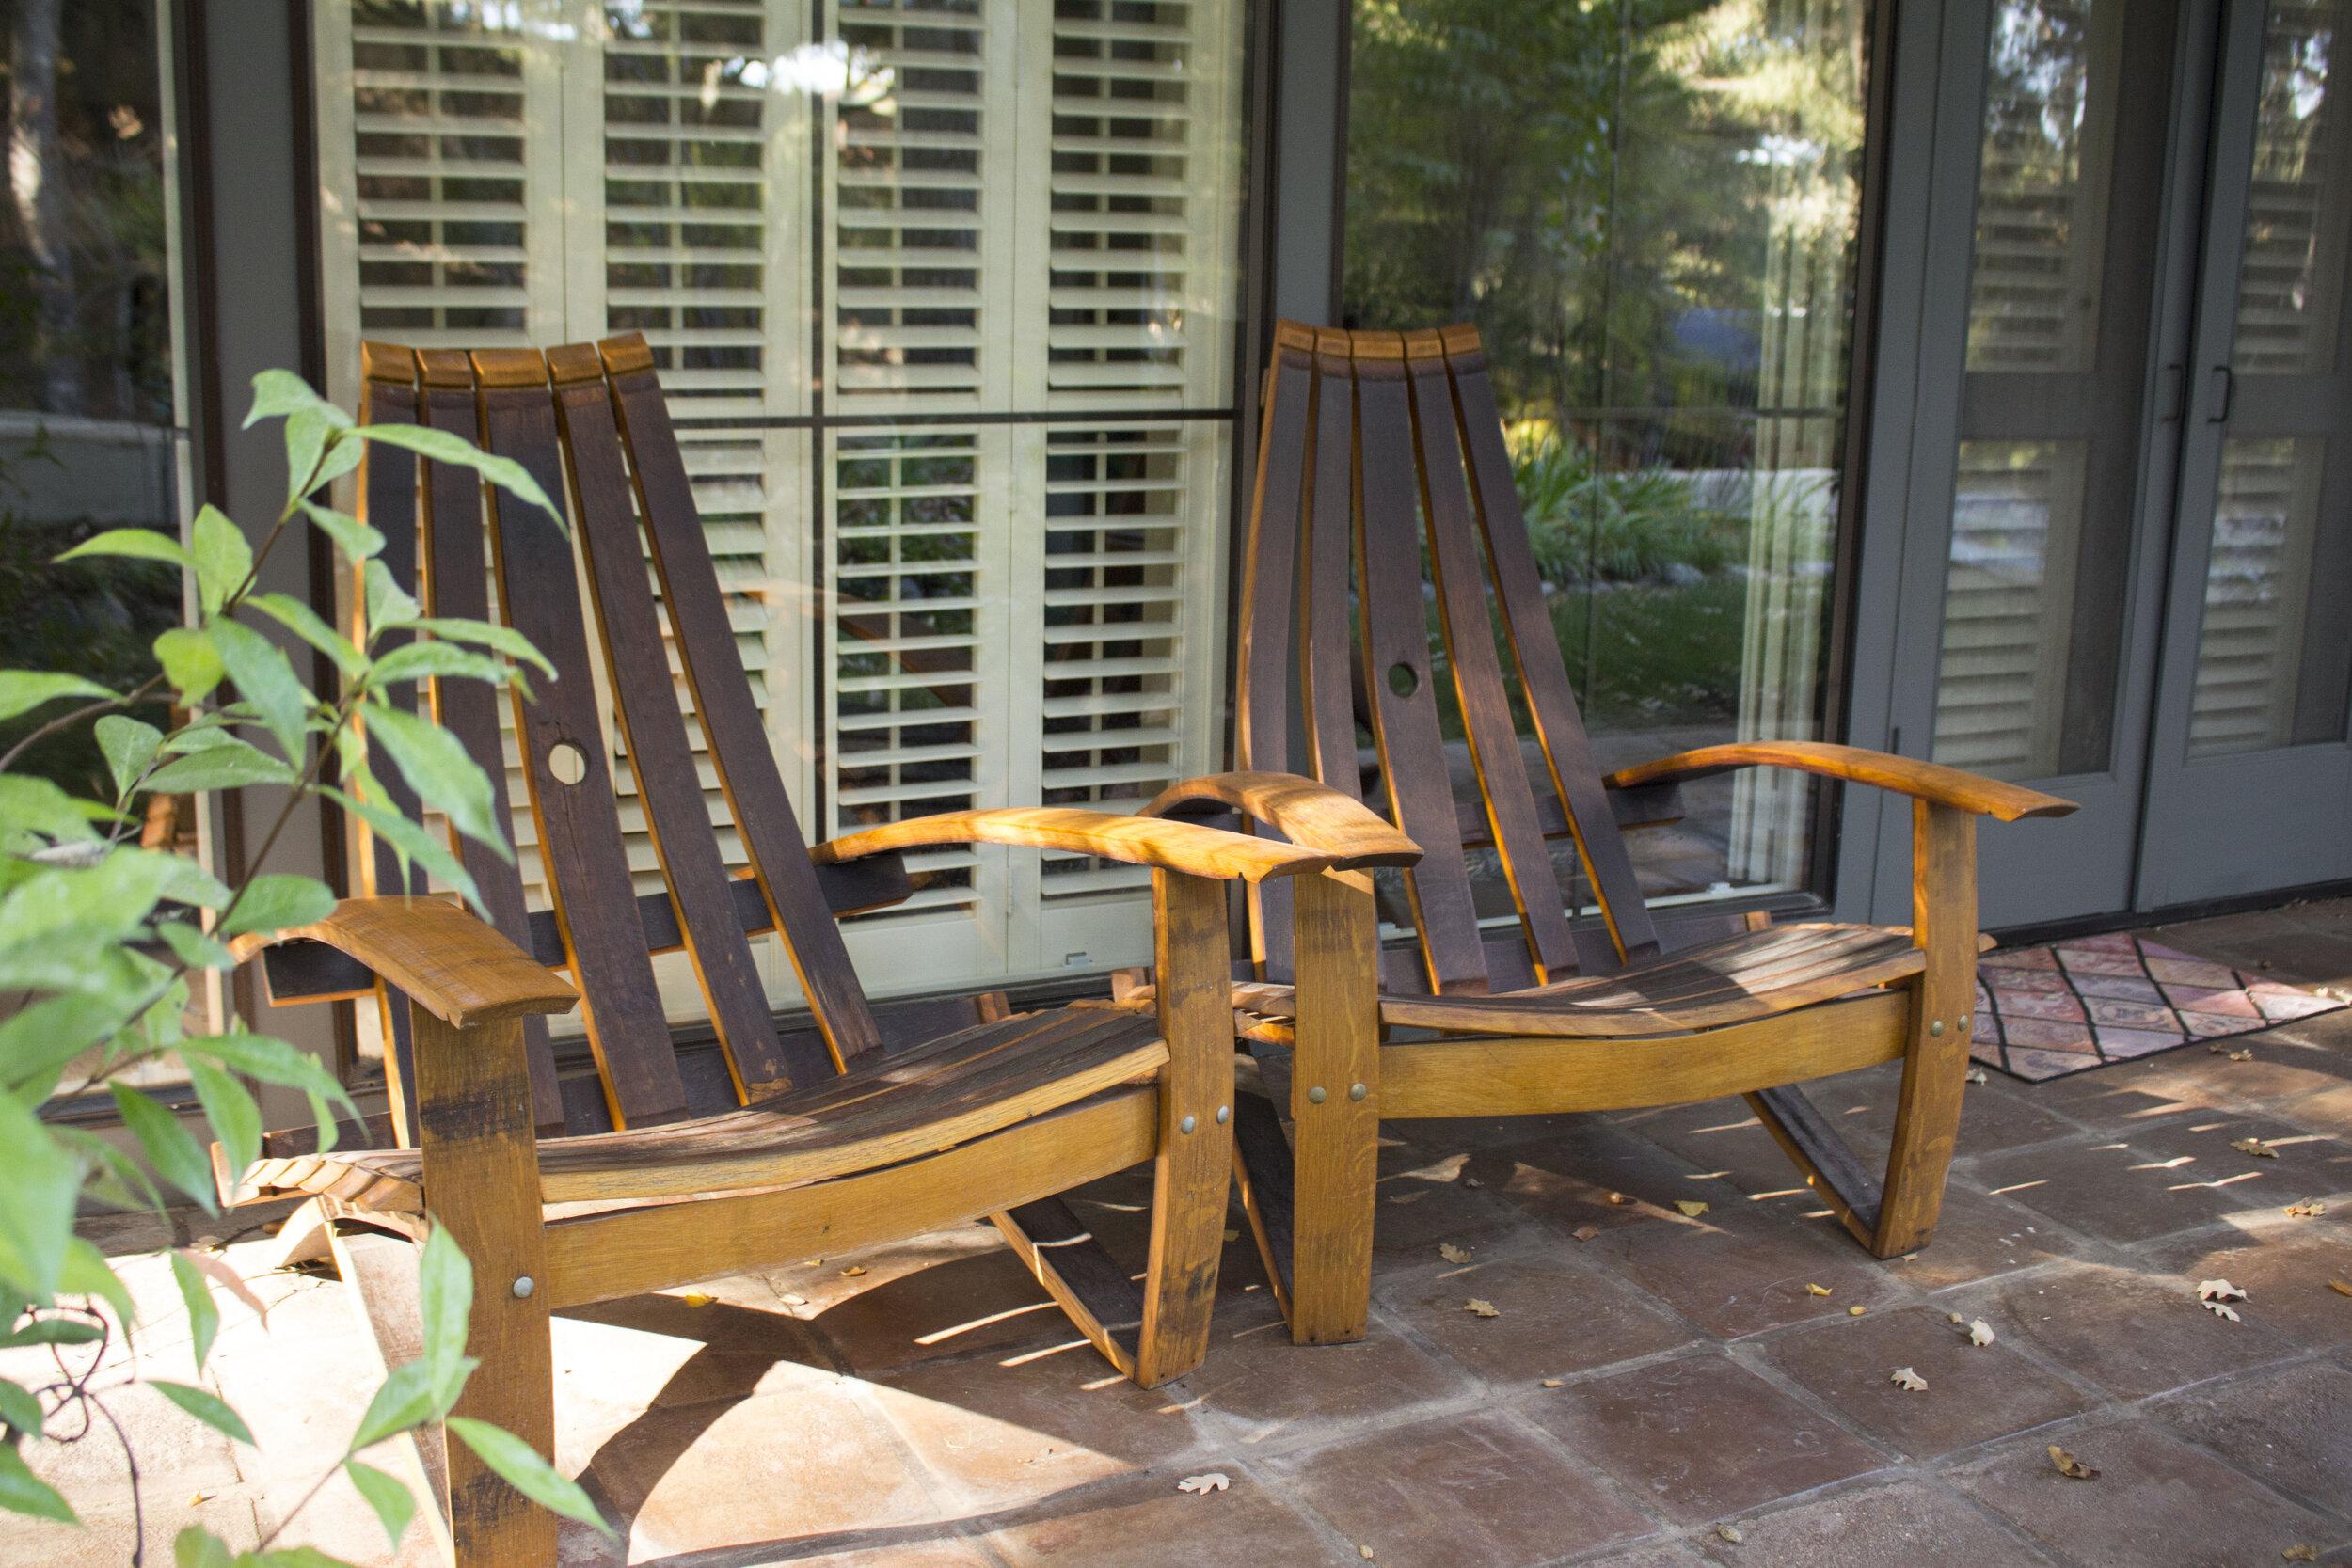 Wine Barrell Chairs.jpg